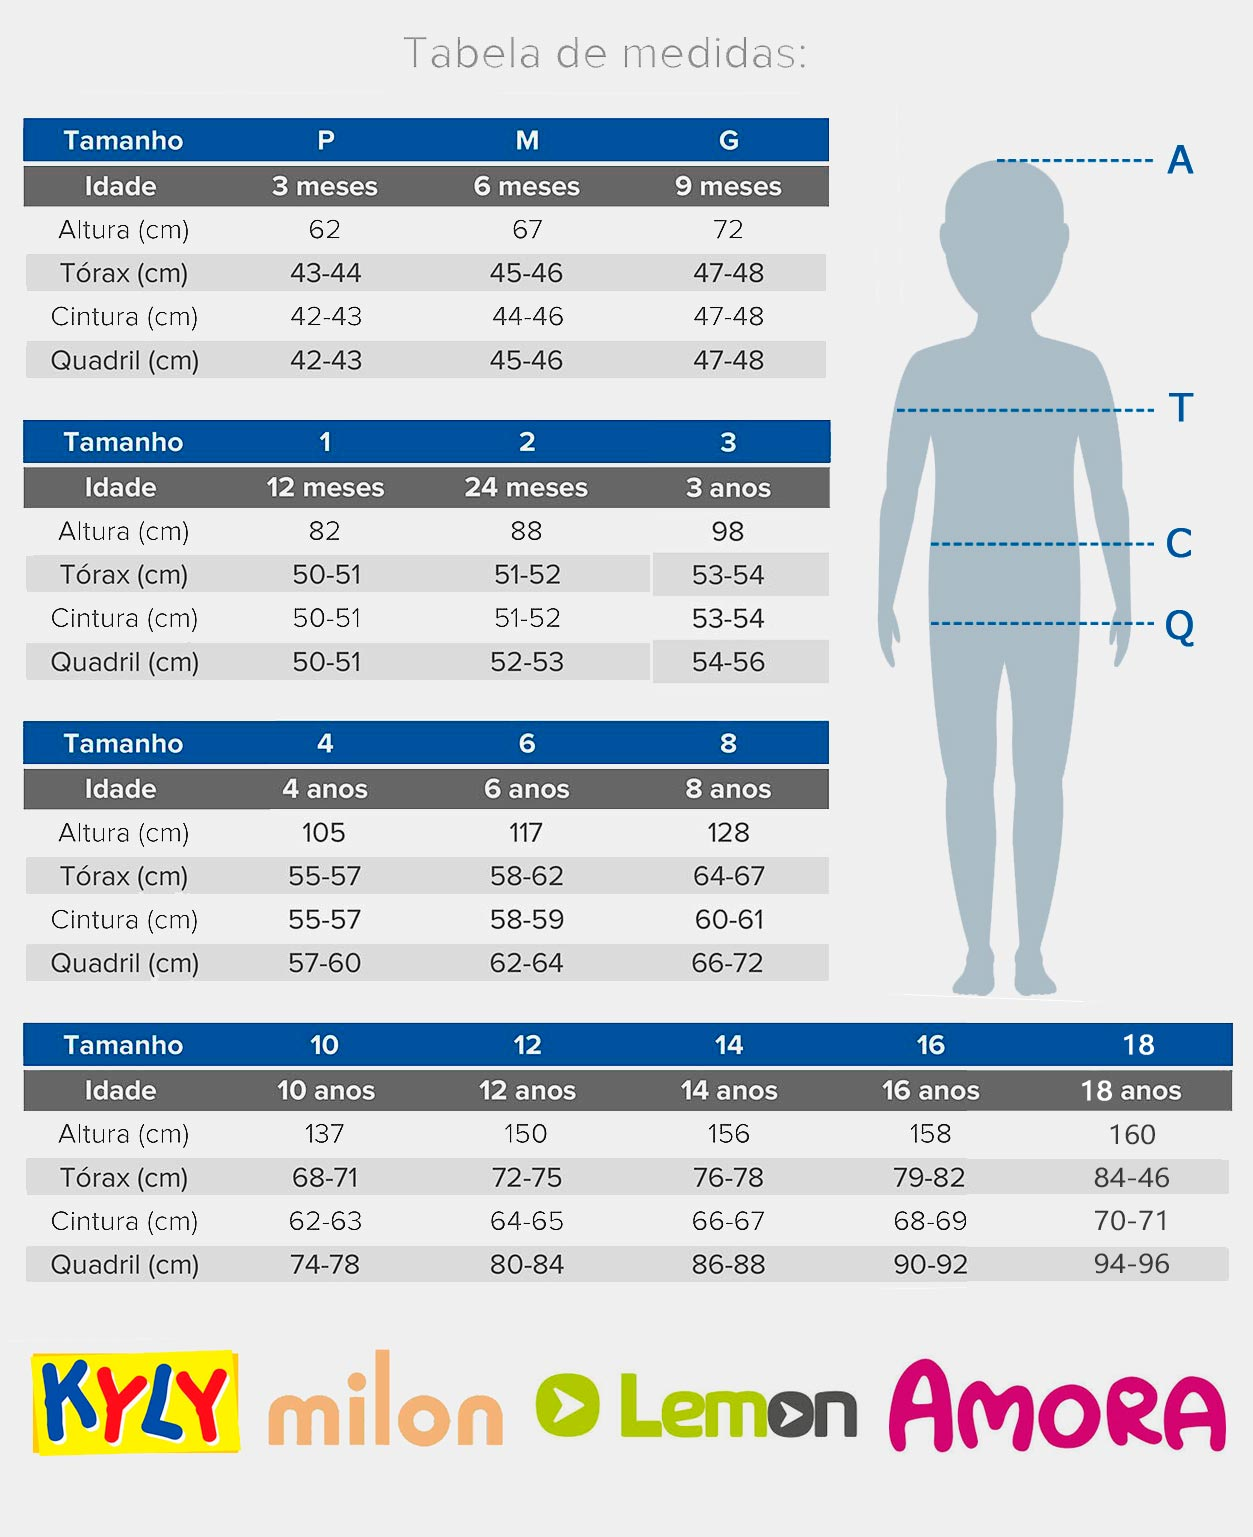 Conjunto Infantil Masculino Azul Inverno Hard Kyly: Tabela de medidas